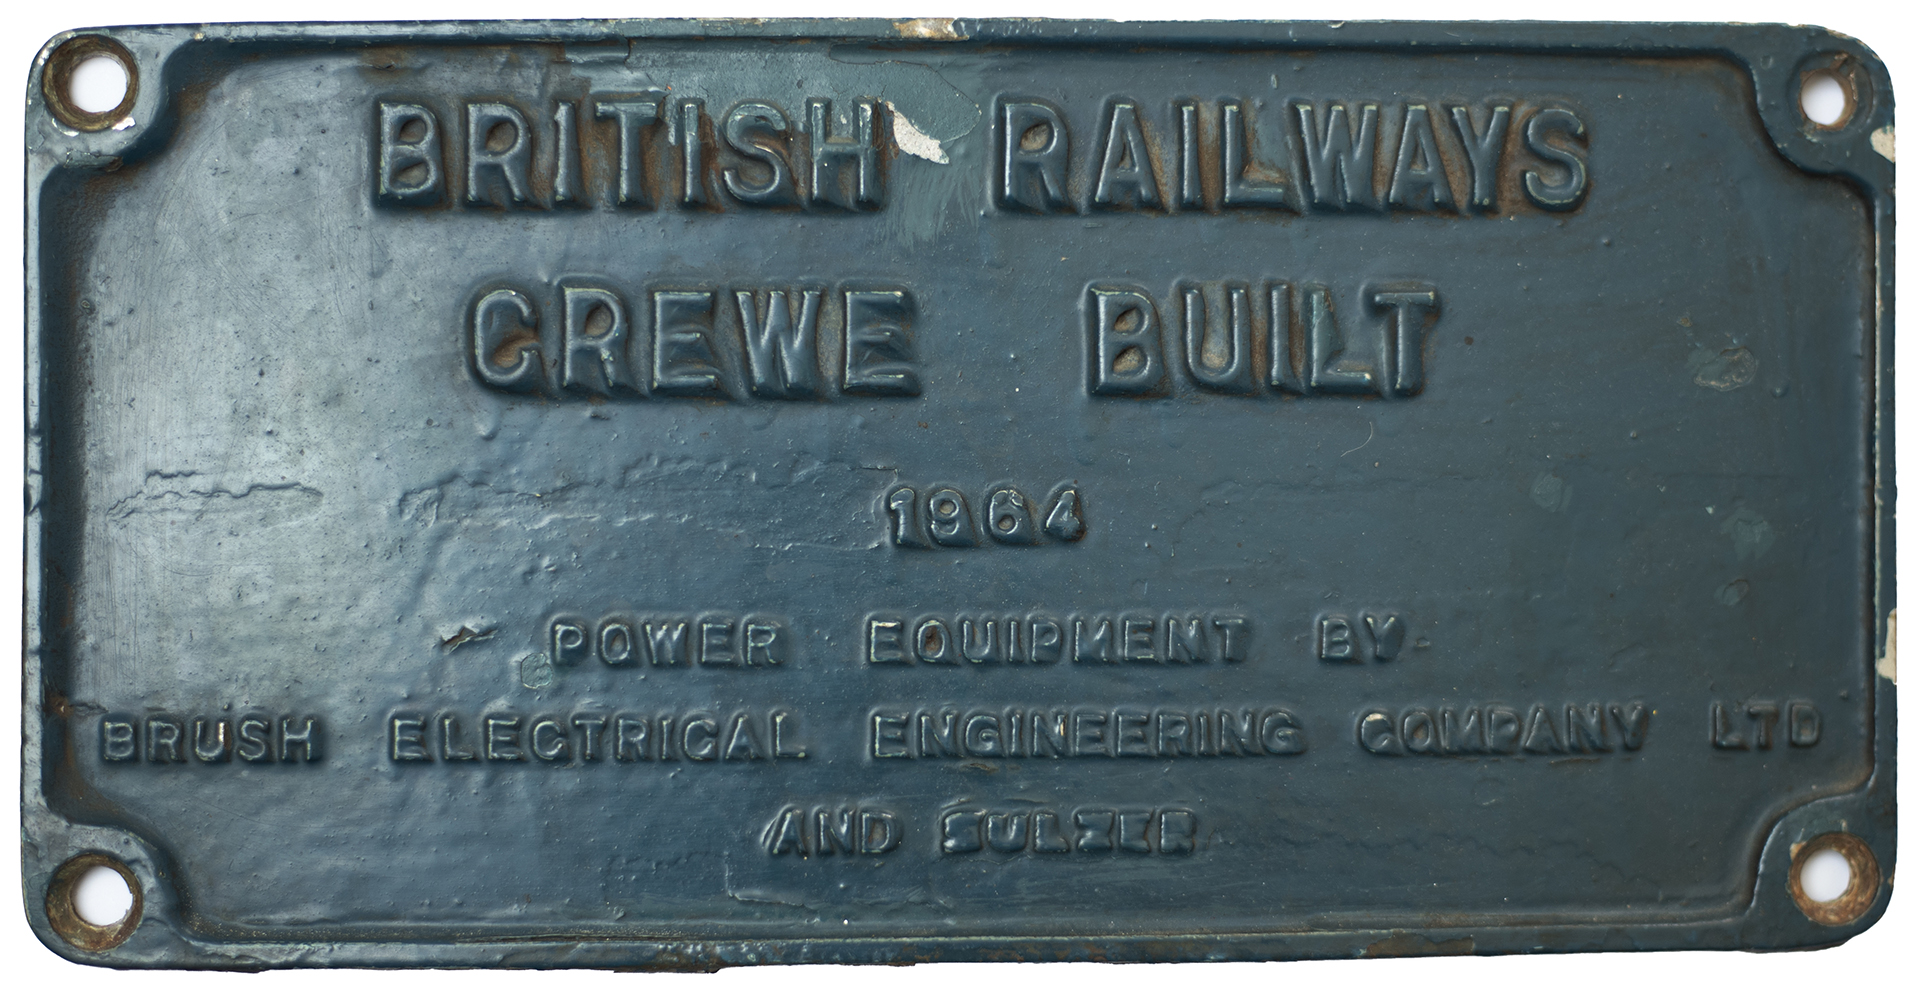 Worksplate BRITISH RAILWAYS CREWE BUILT 1964 POWER EQUIPMENT BY BRUSH ELECTRICAL ENGINEERING COMPANY